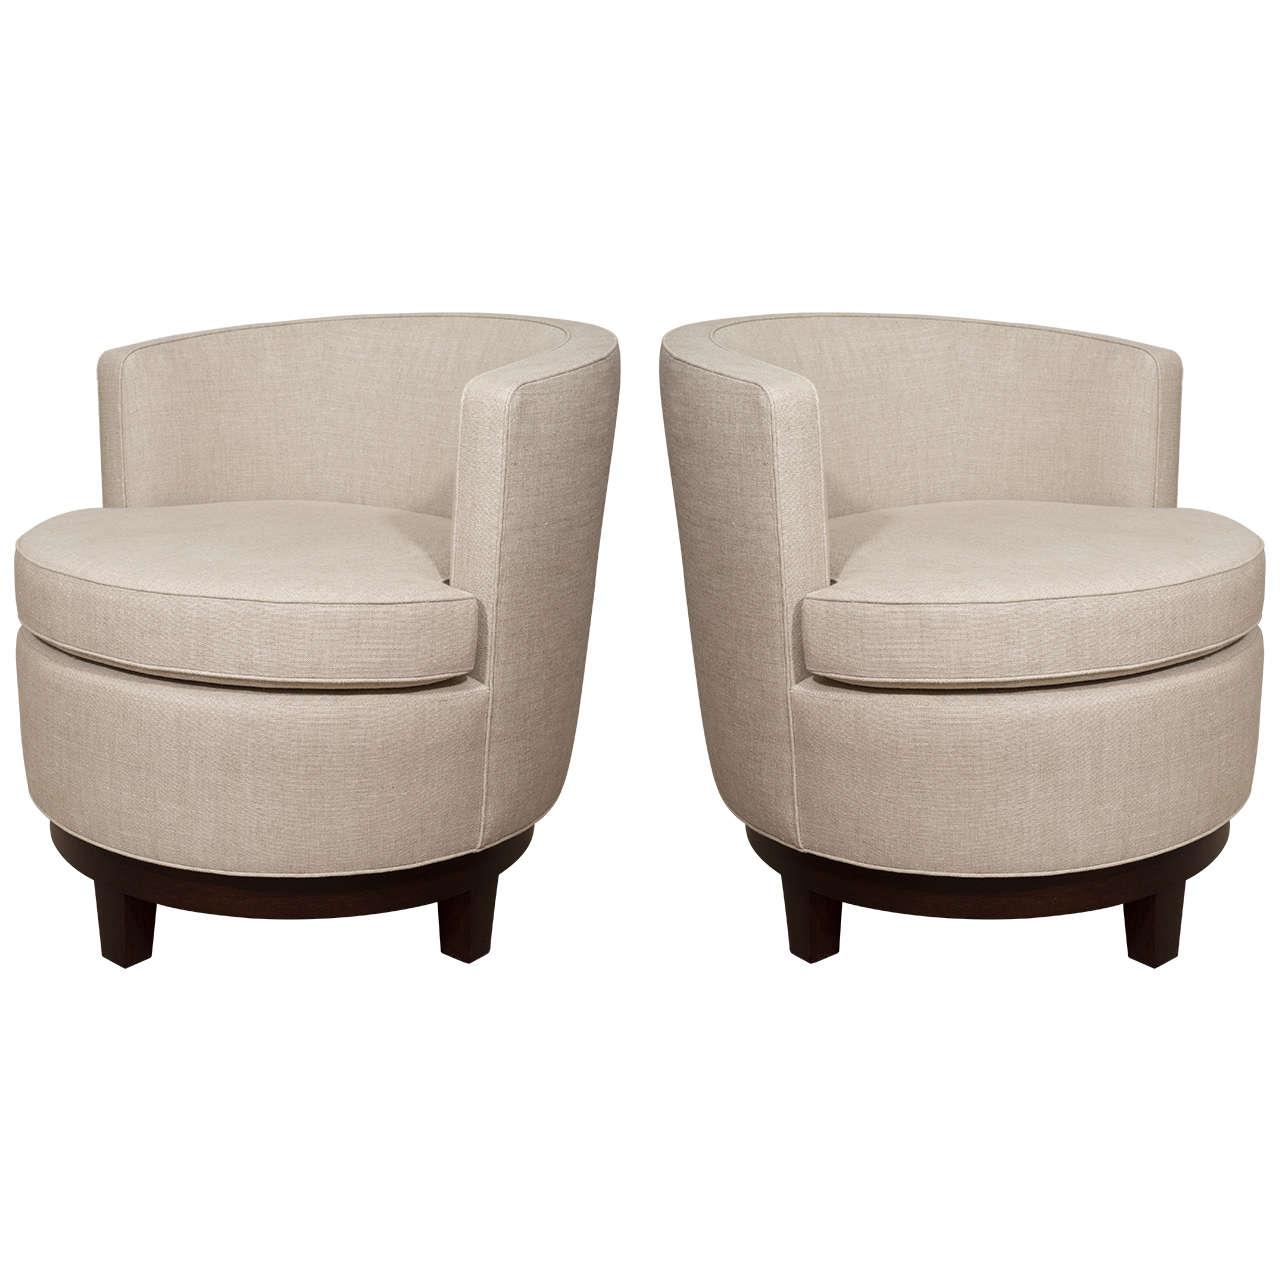 Swivel Chairs Living Room Upholstered Peenmedia Com